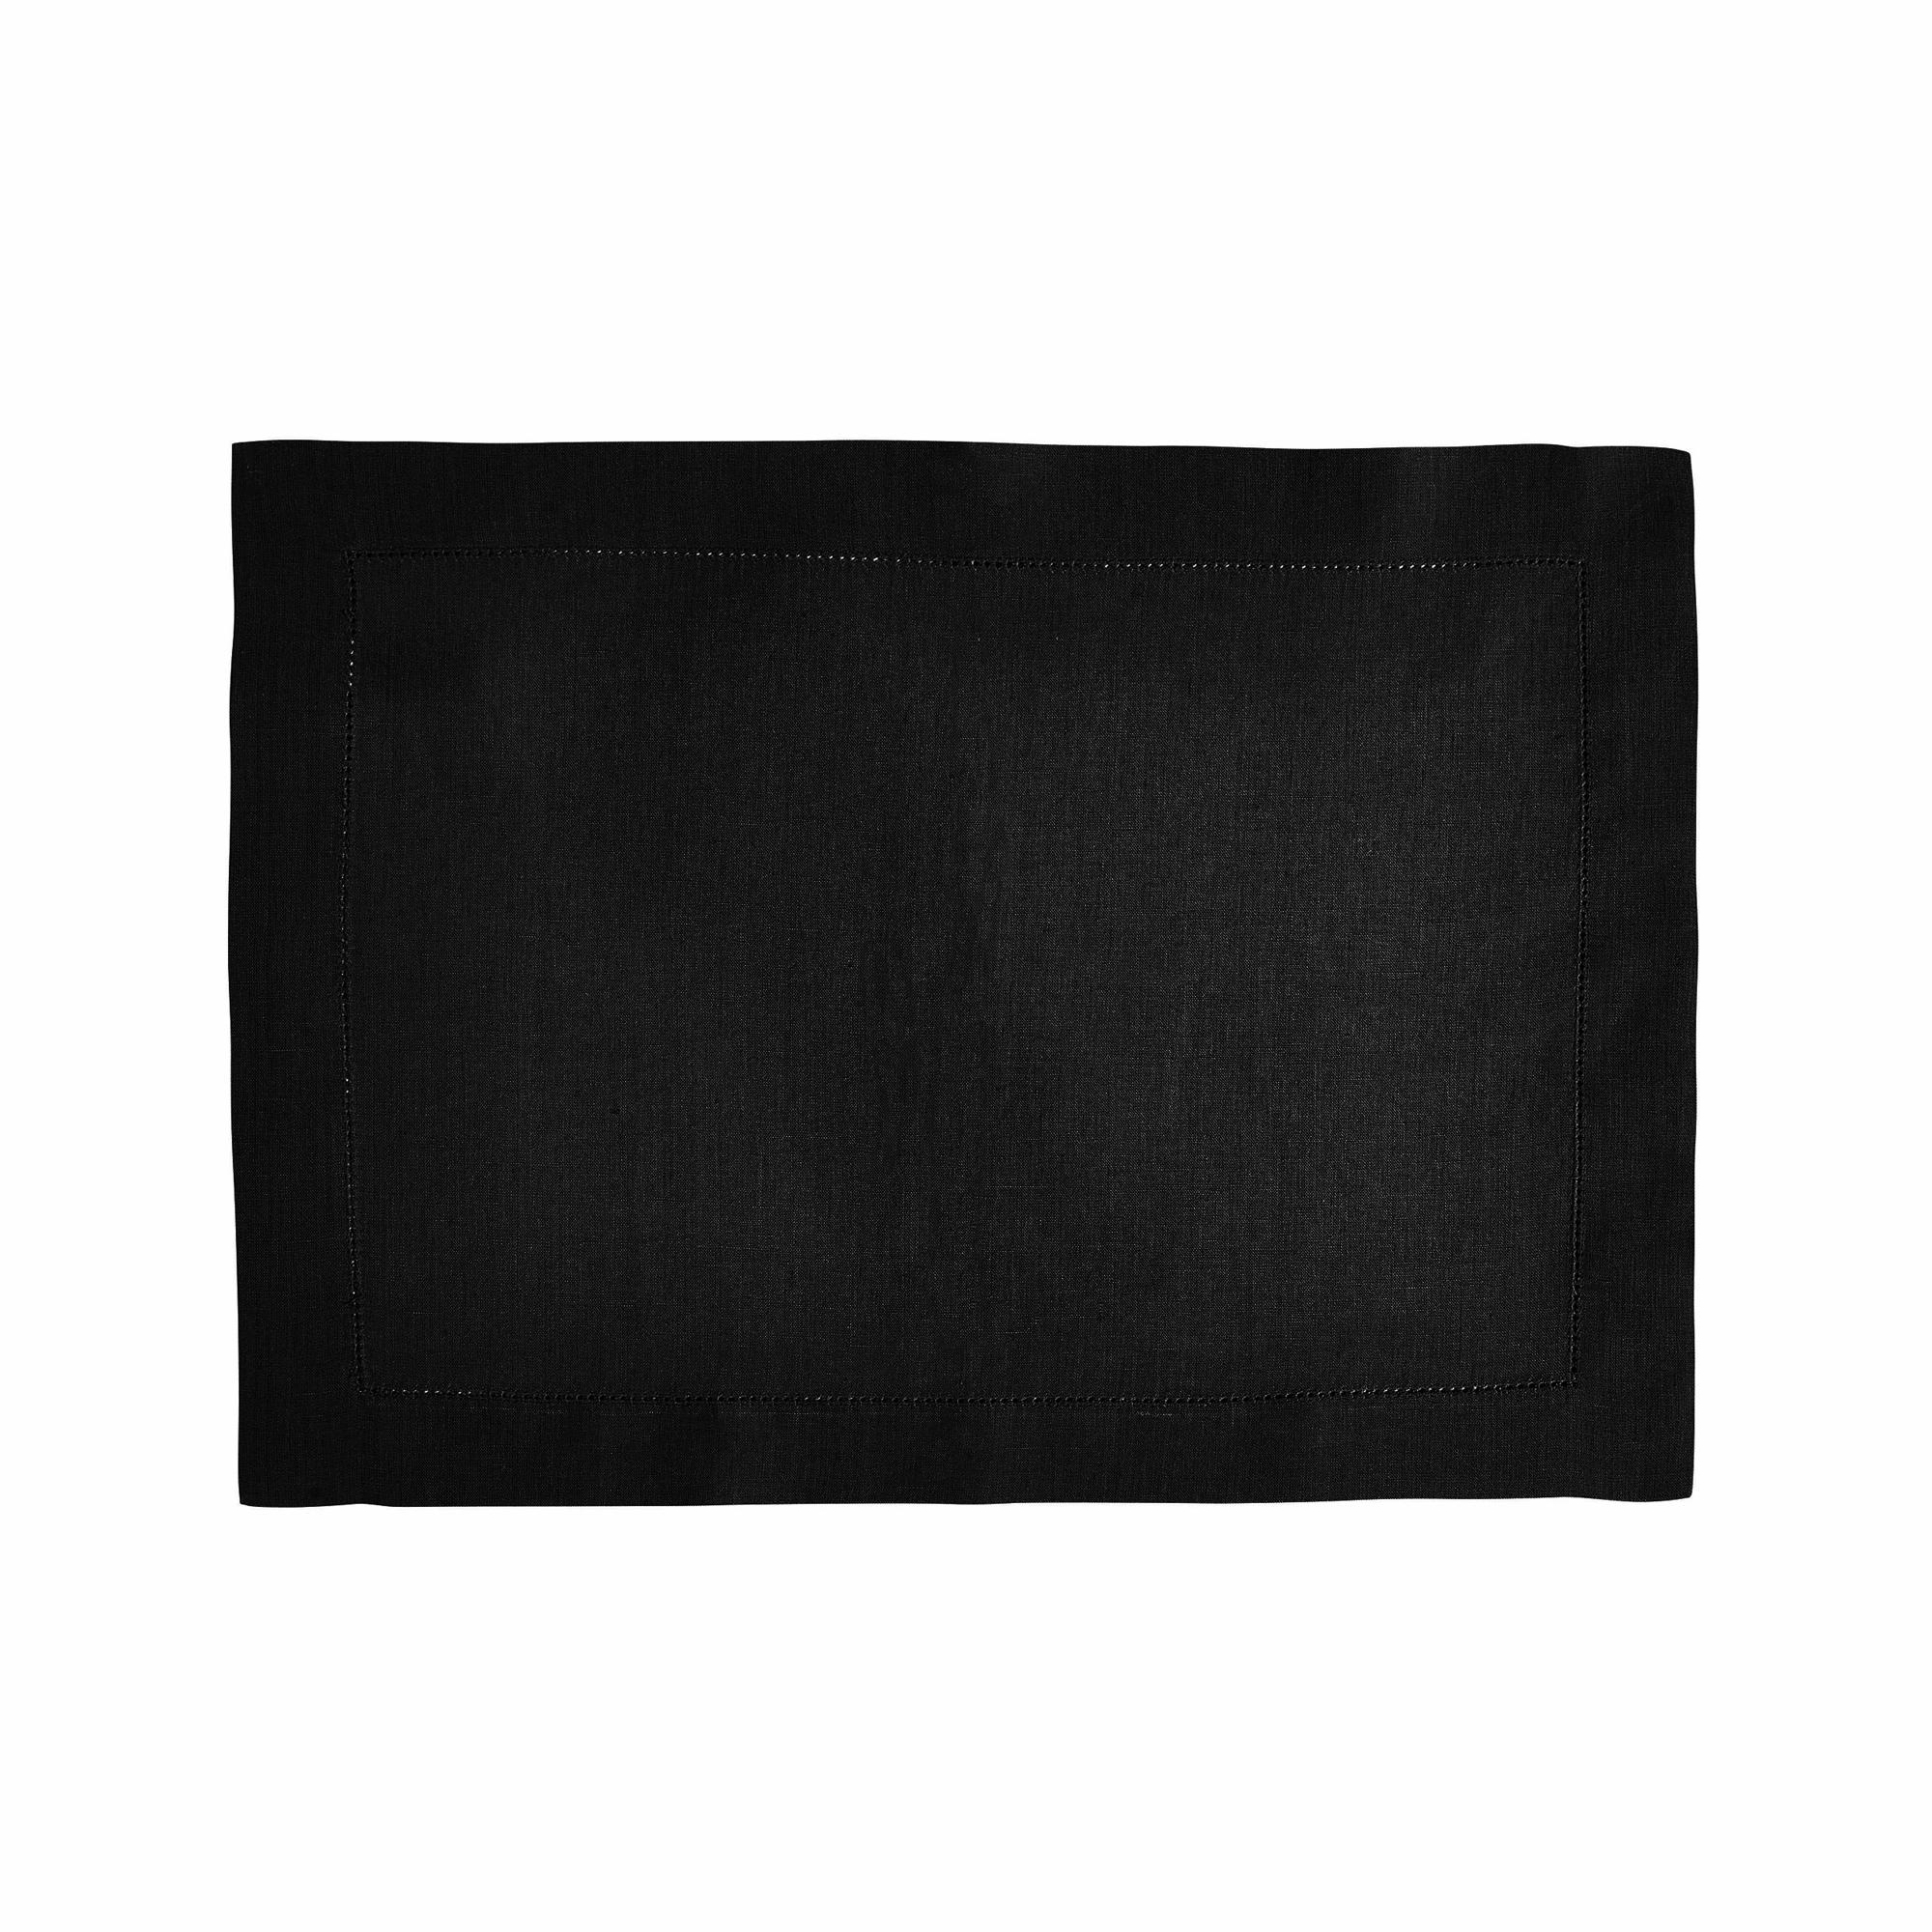 Set de table en lin noir 37x50